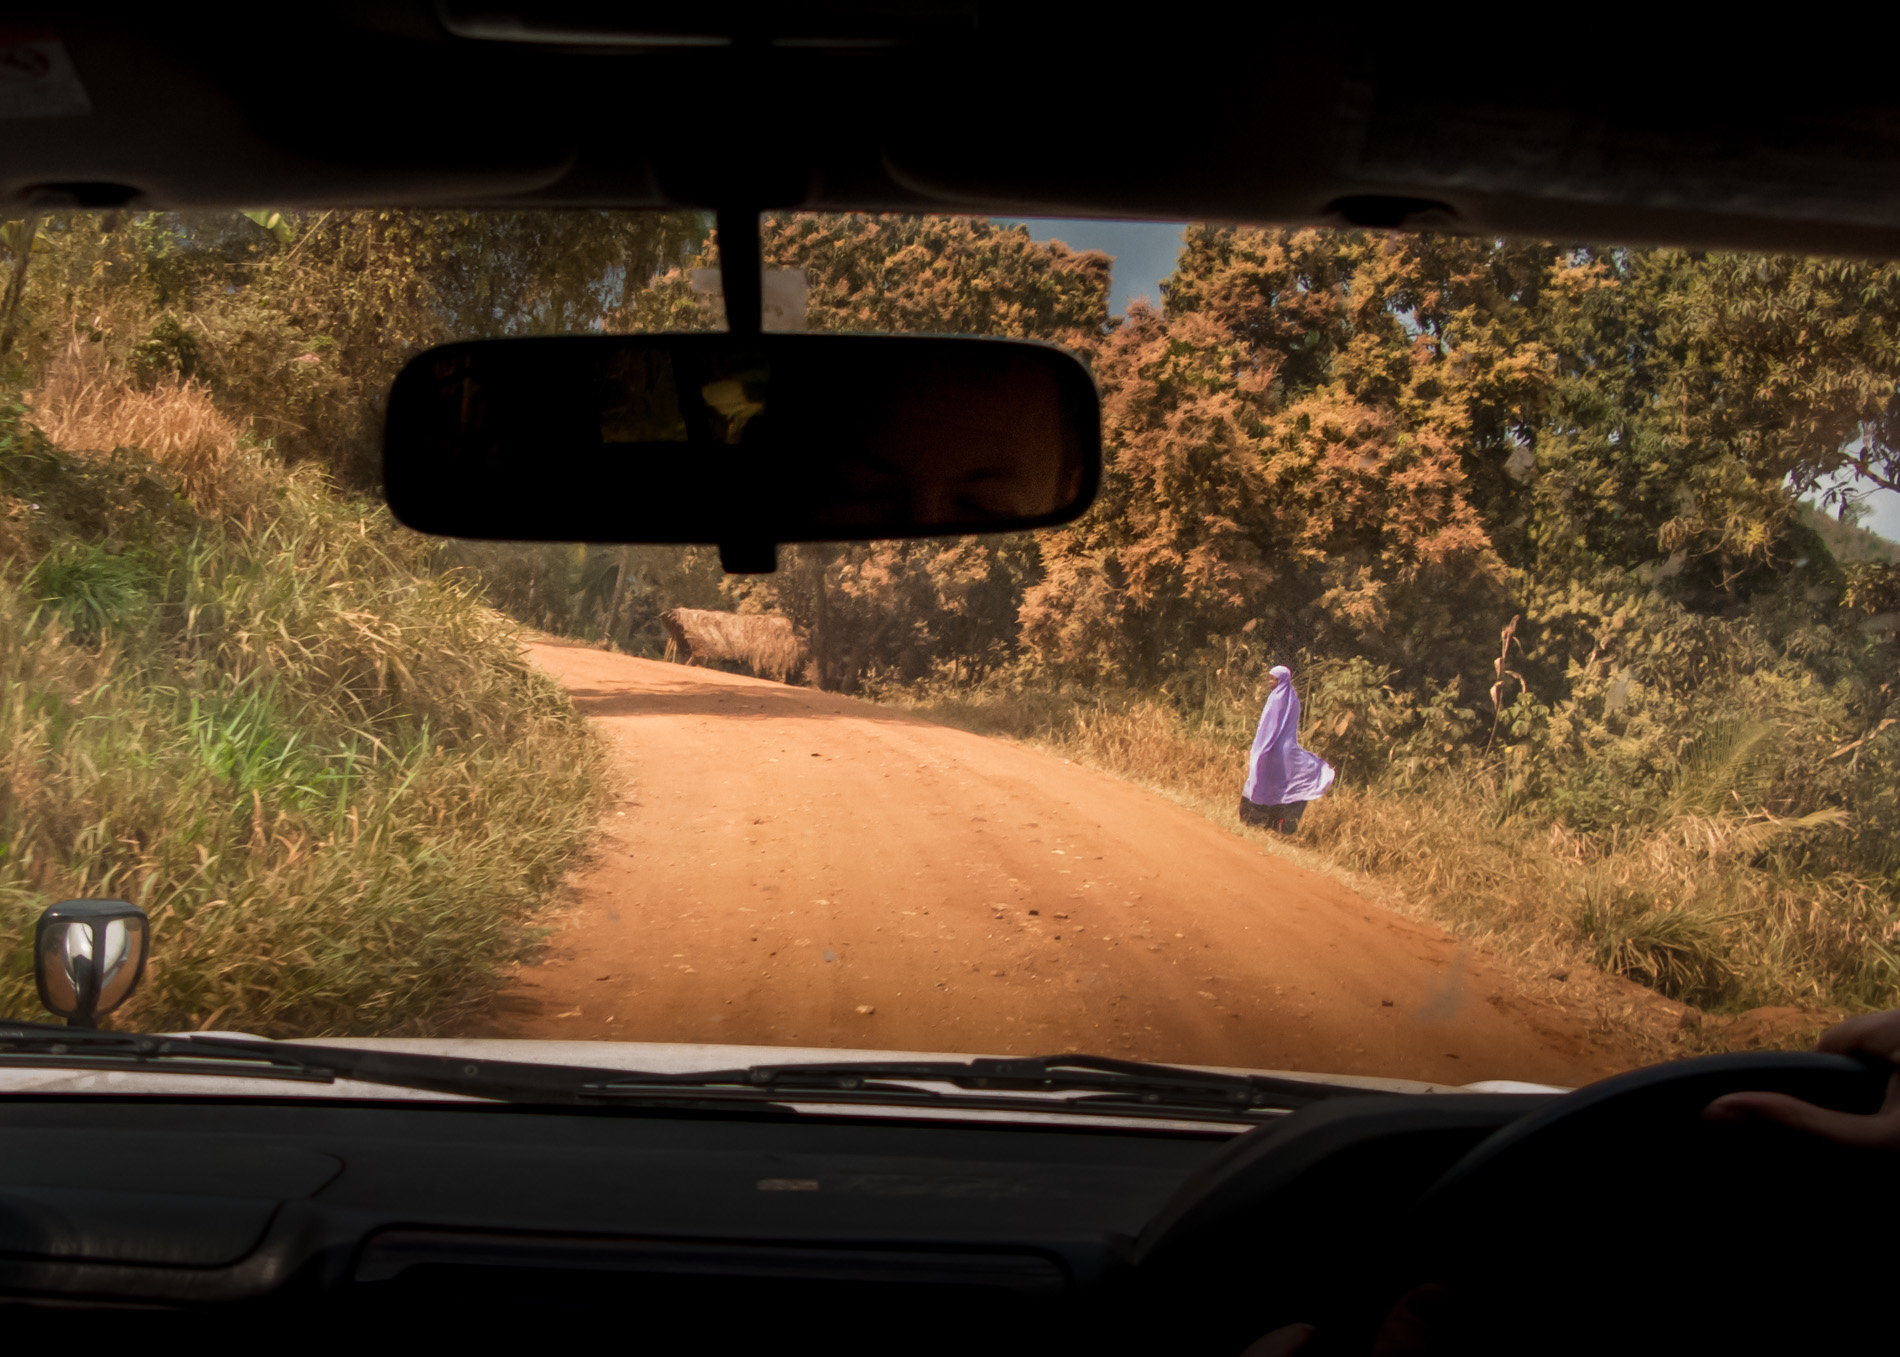 Tanzania,_Back_Seat_View-1762.jpg